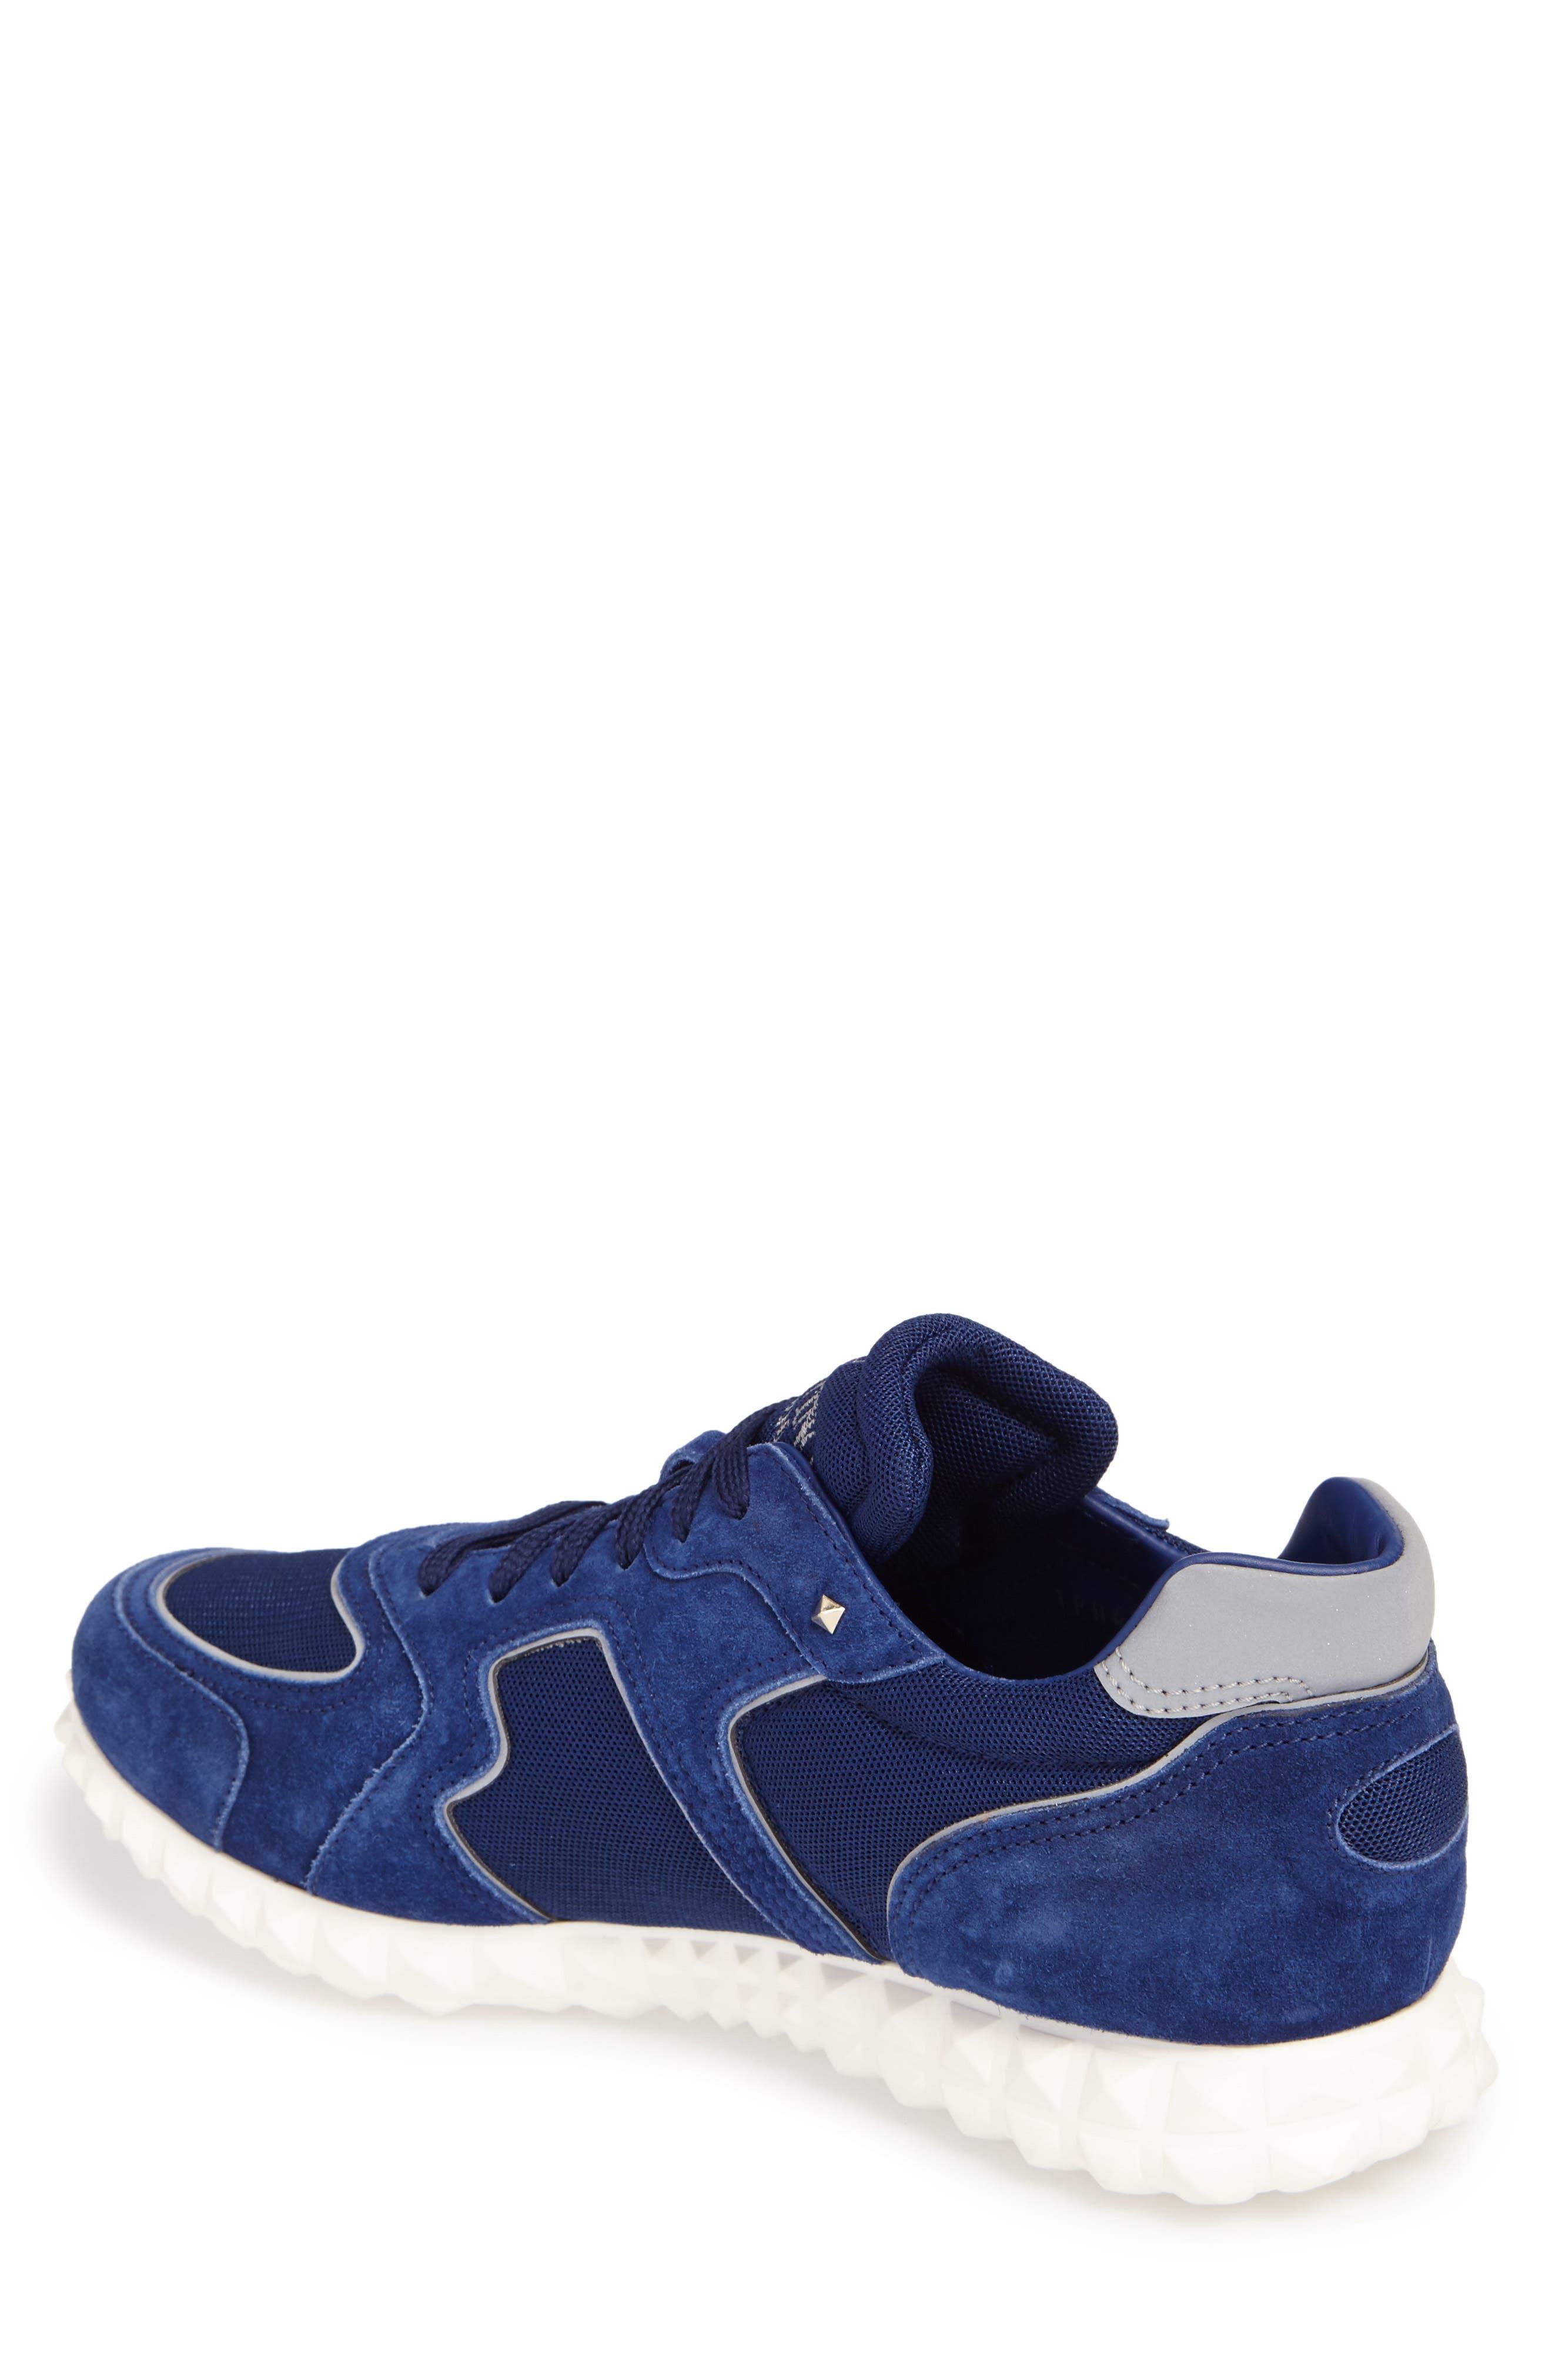 Soul AM Sneaker,                             Alternate thumbnail 2, color,                             Blue Royal/ Blue Royal